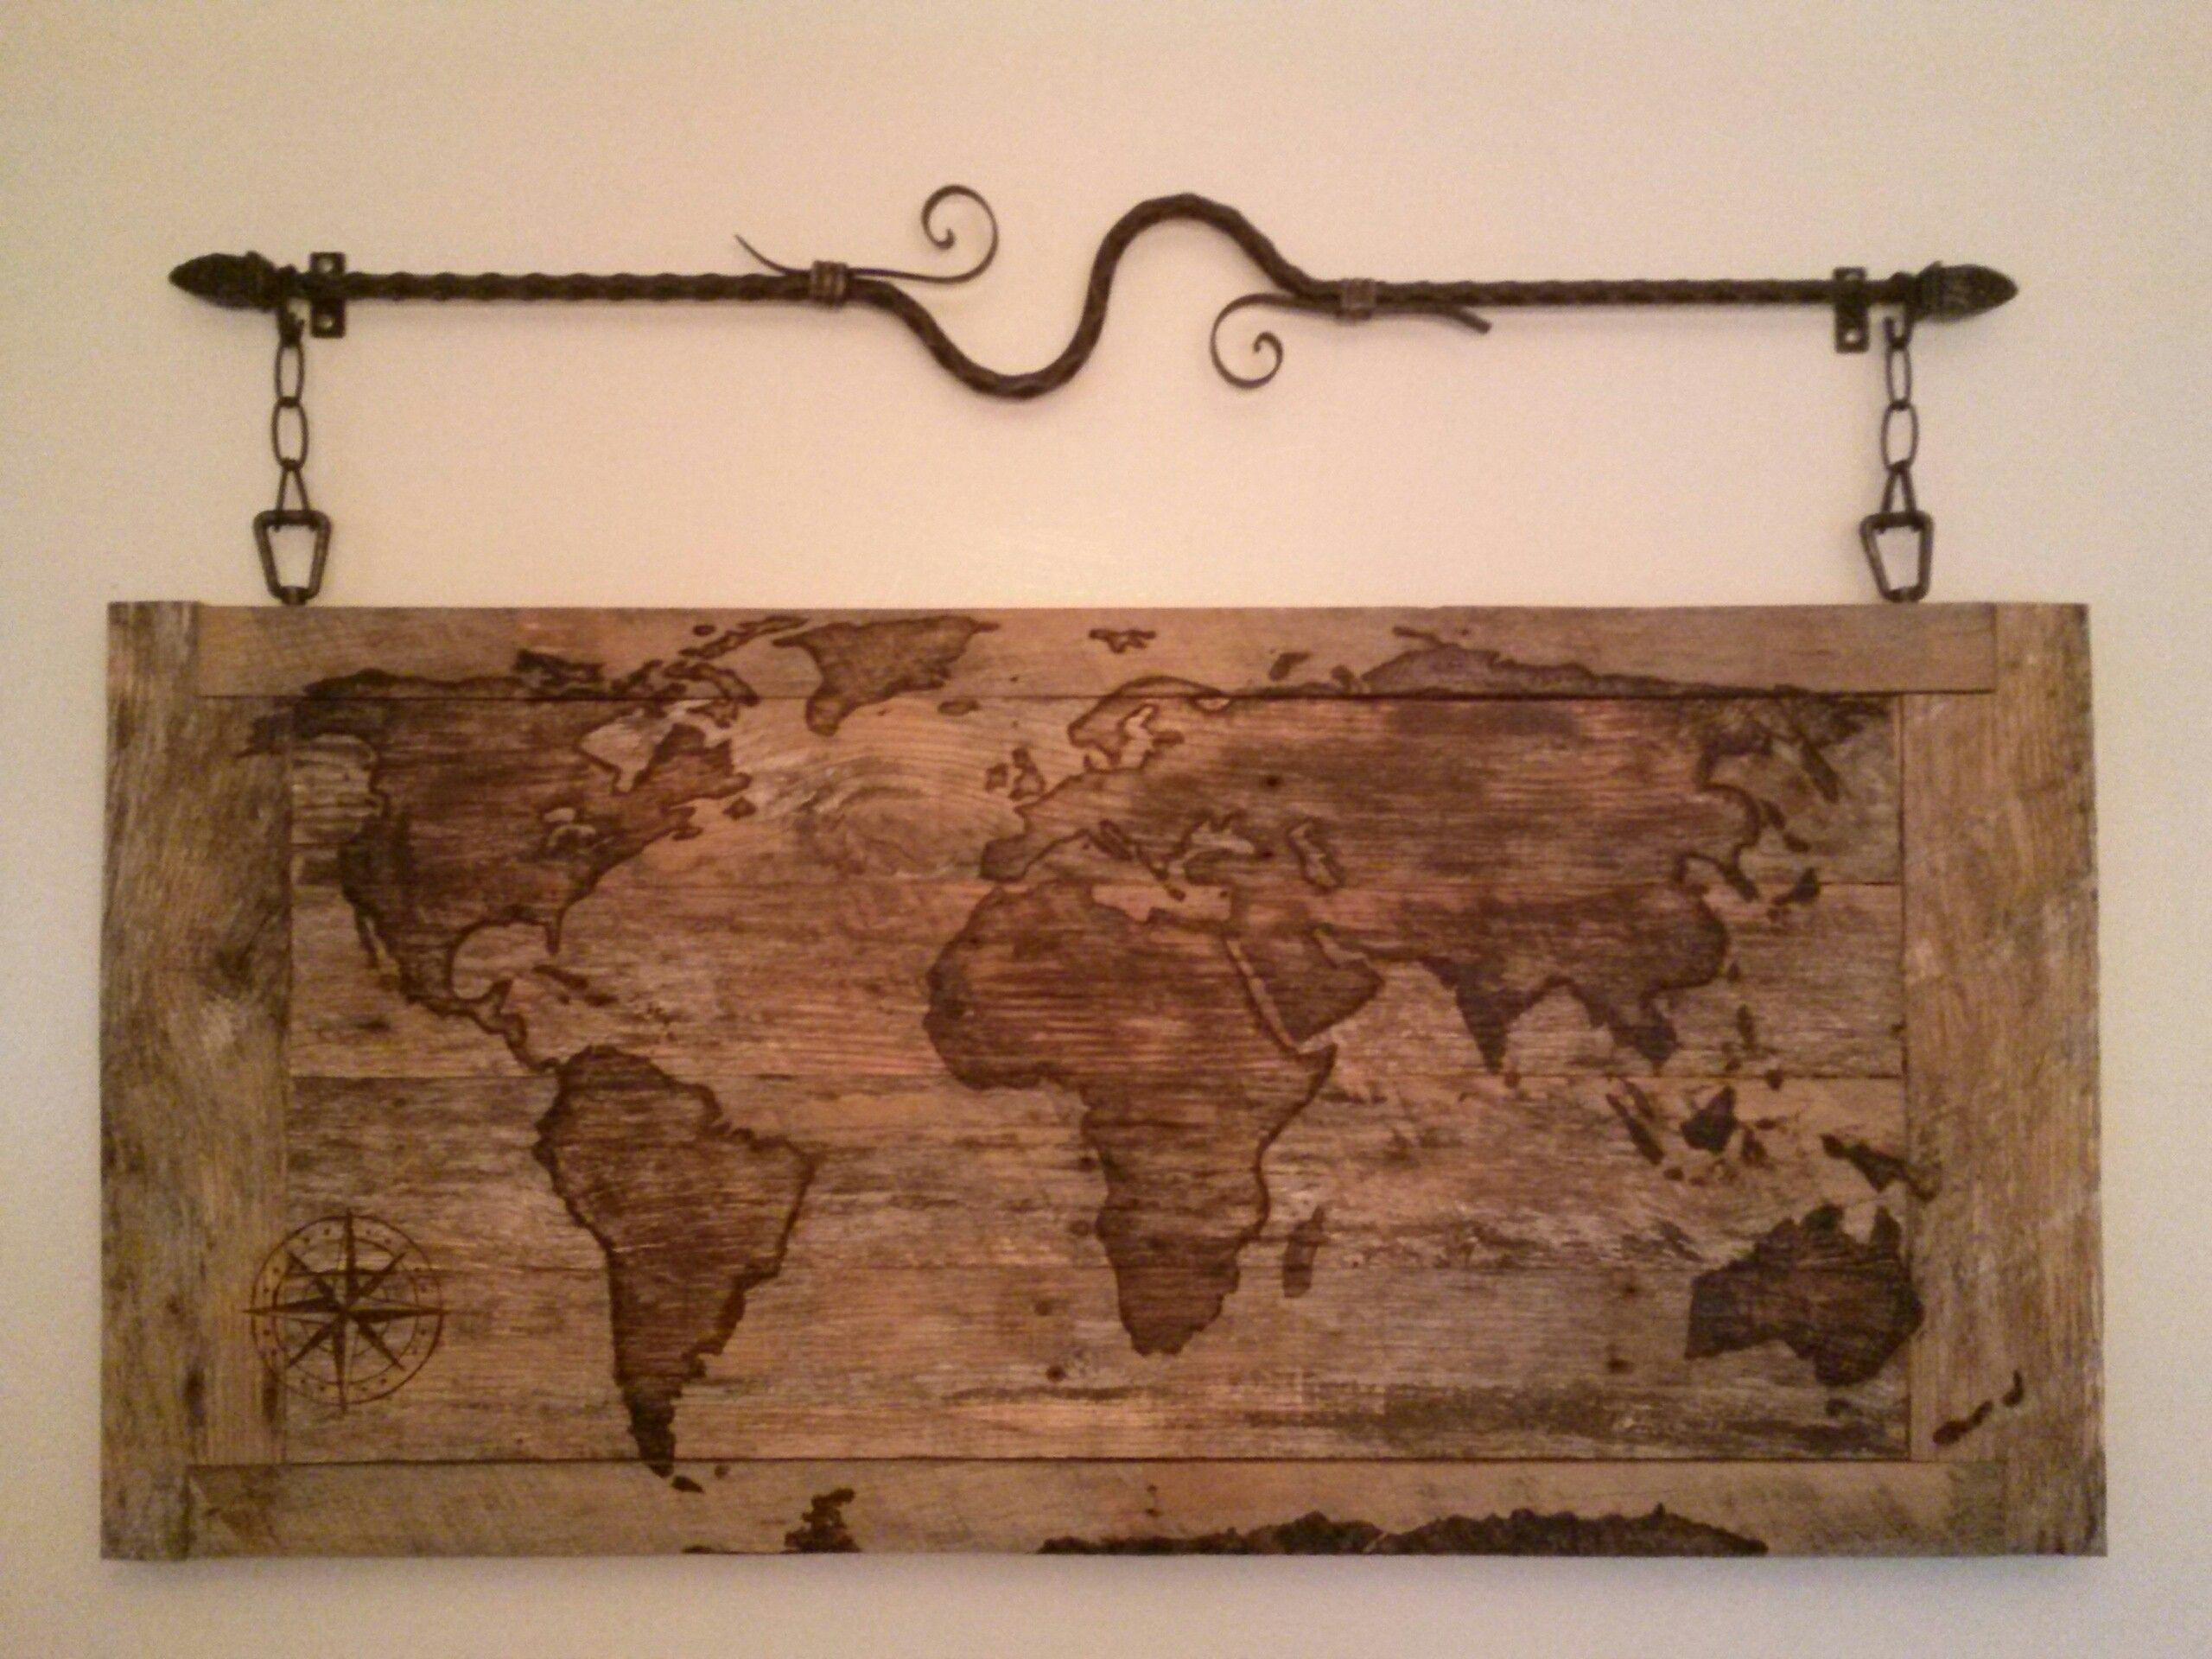 Wood burned world map on reclaimed wood